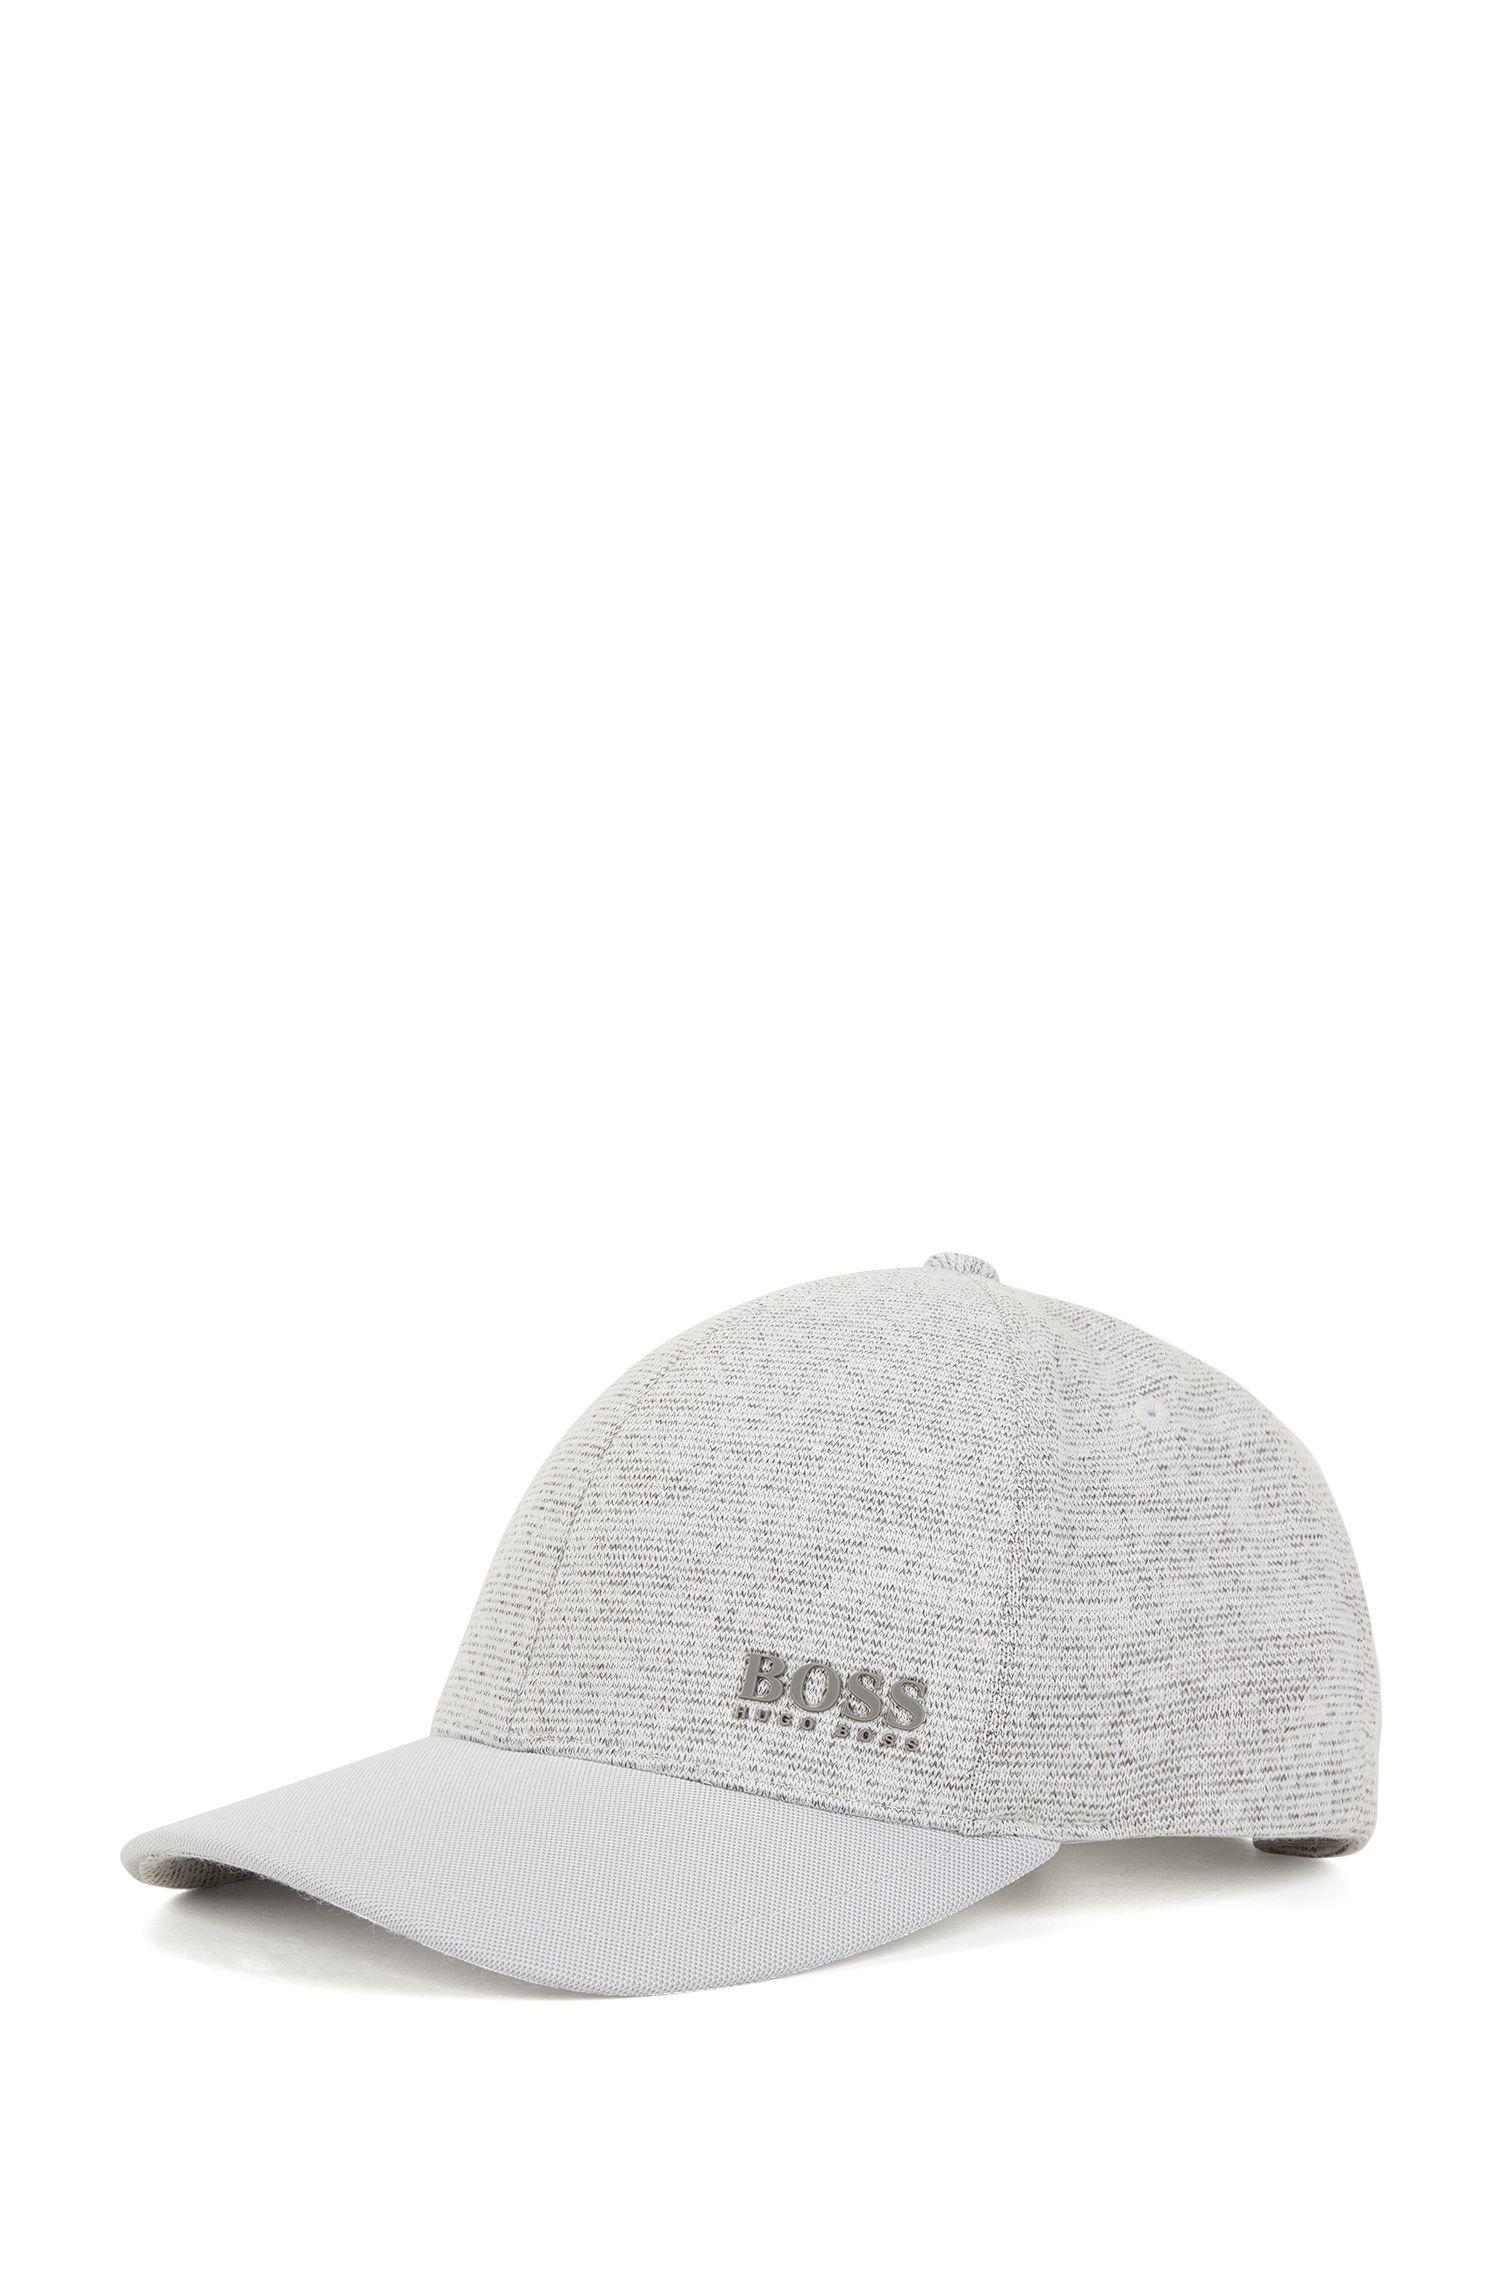 Cappellino da baseball in tessuto ibrido con piqué tecnico